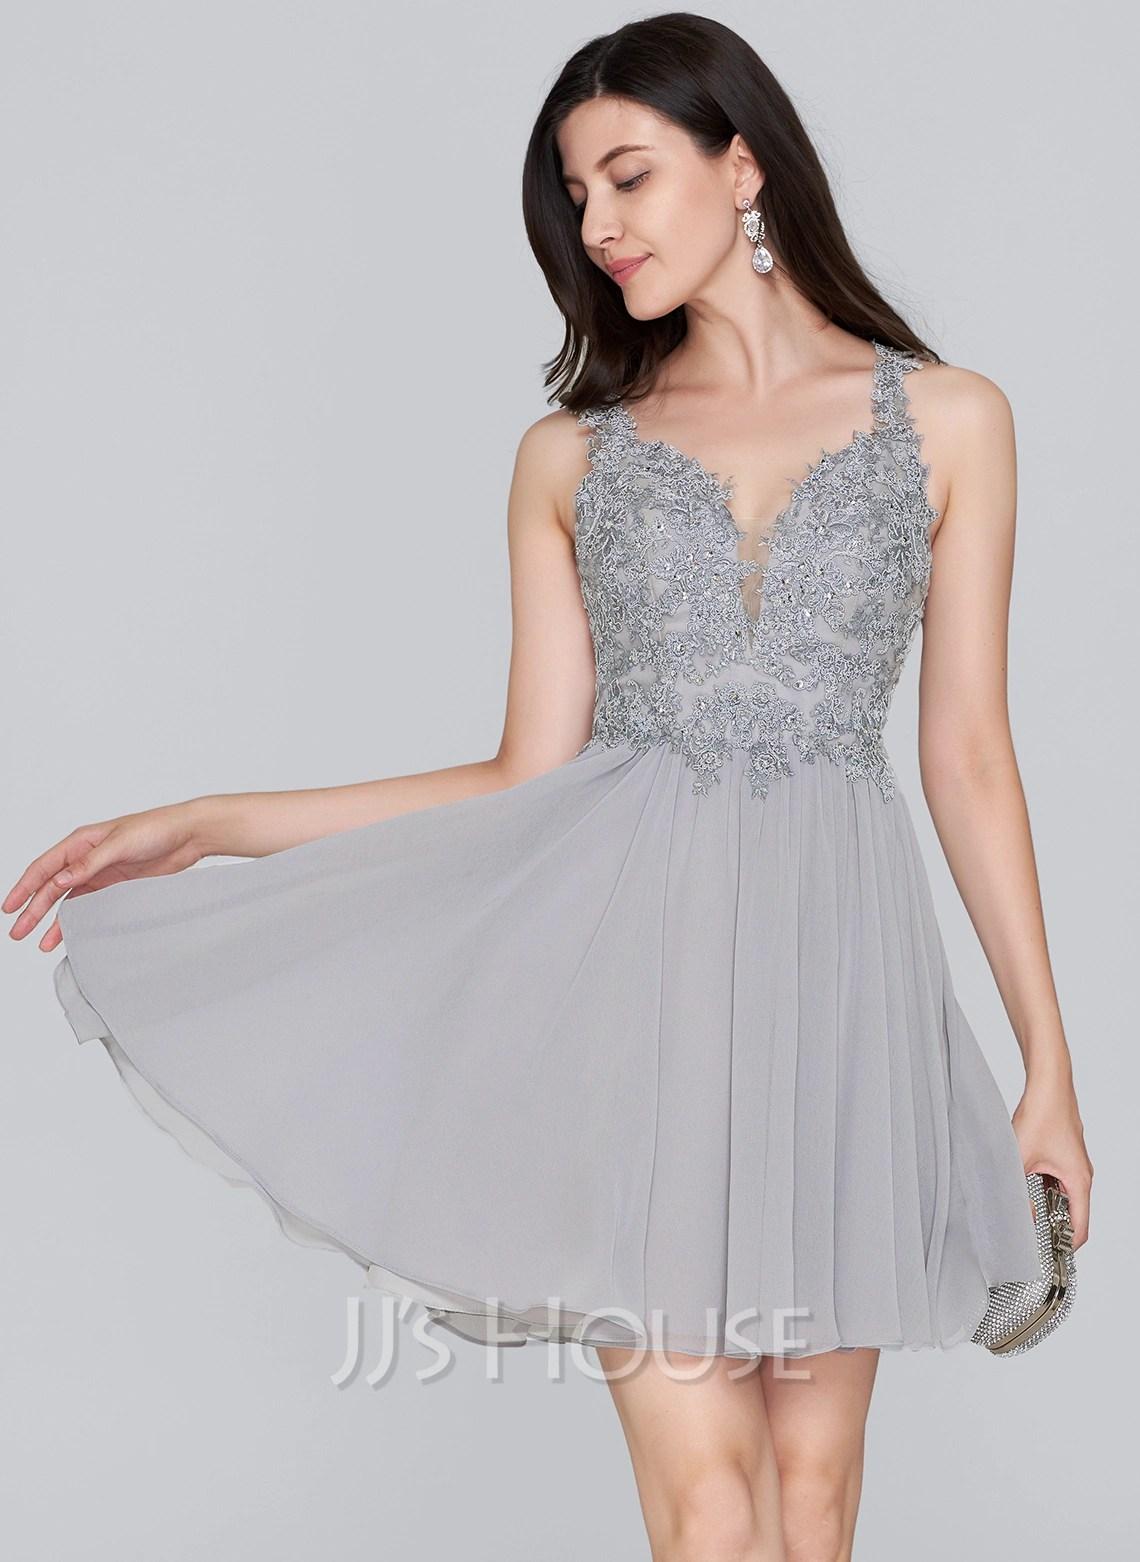 ALinePrincess Sweetheart ShortMini Chiffon Homecoming Dress With Beading Sequins 022124861